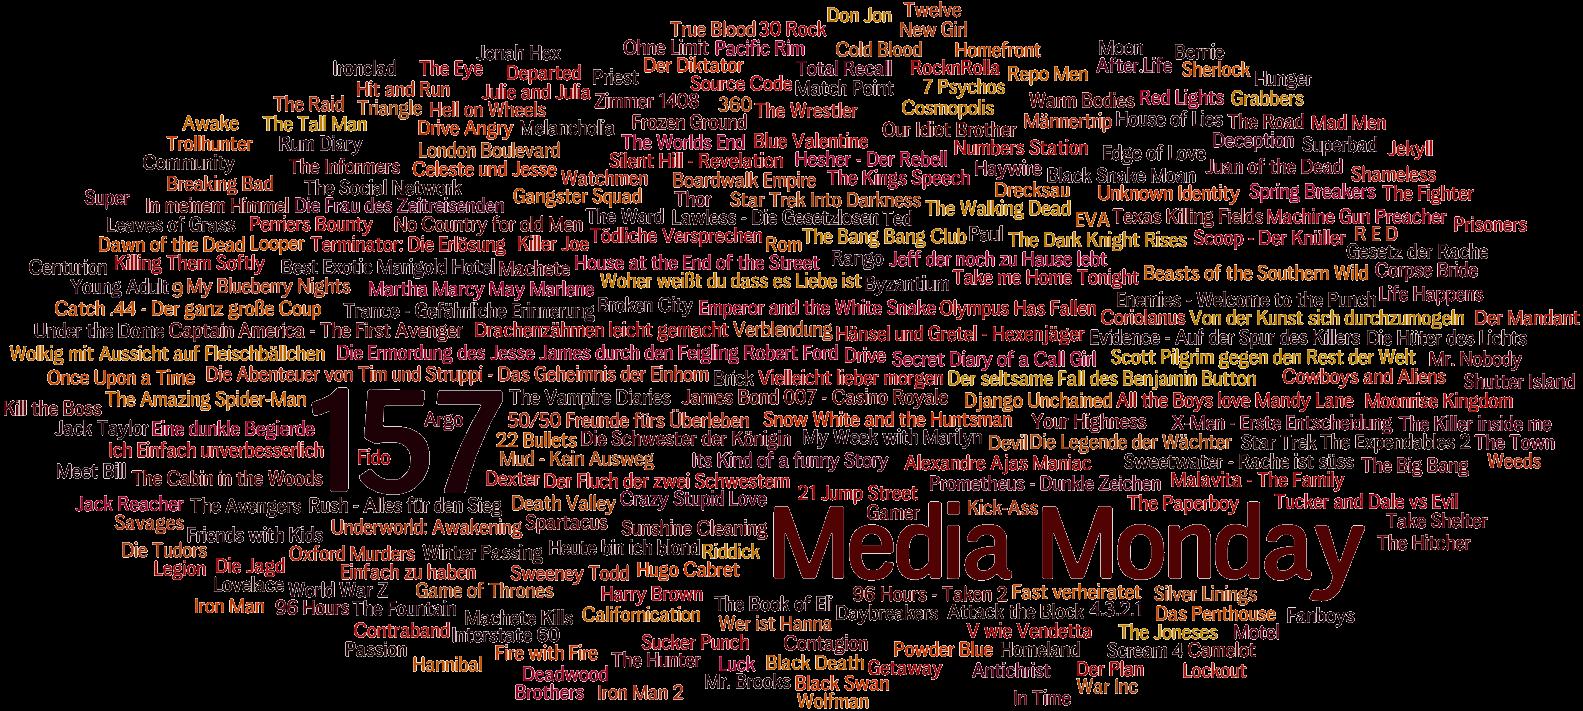 Media Monday #157